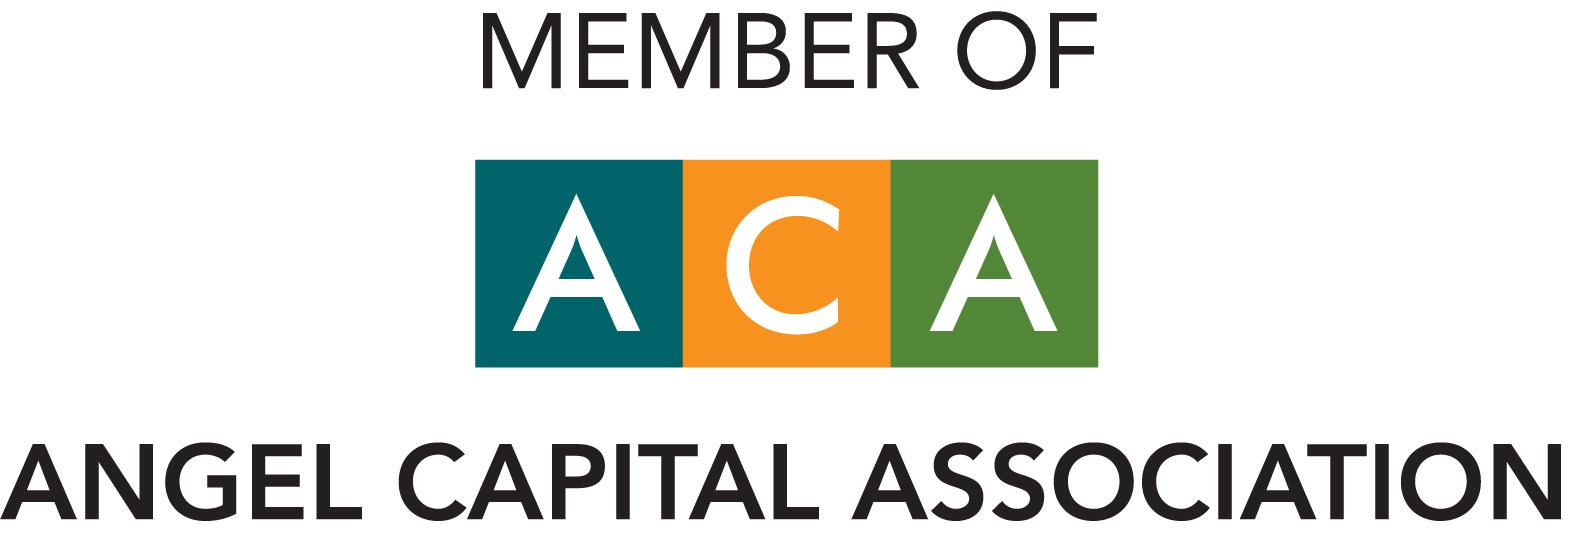 aca_member.jpg